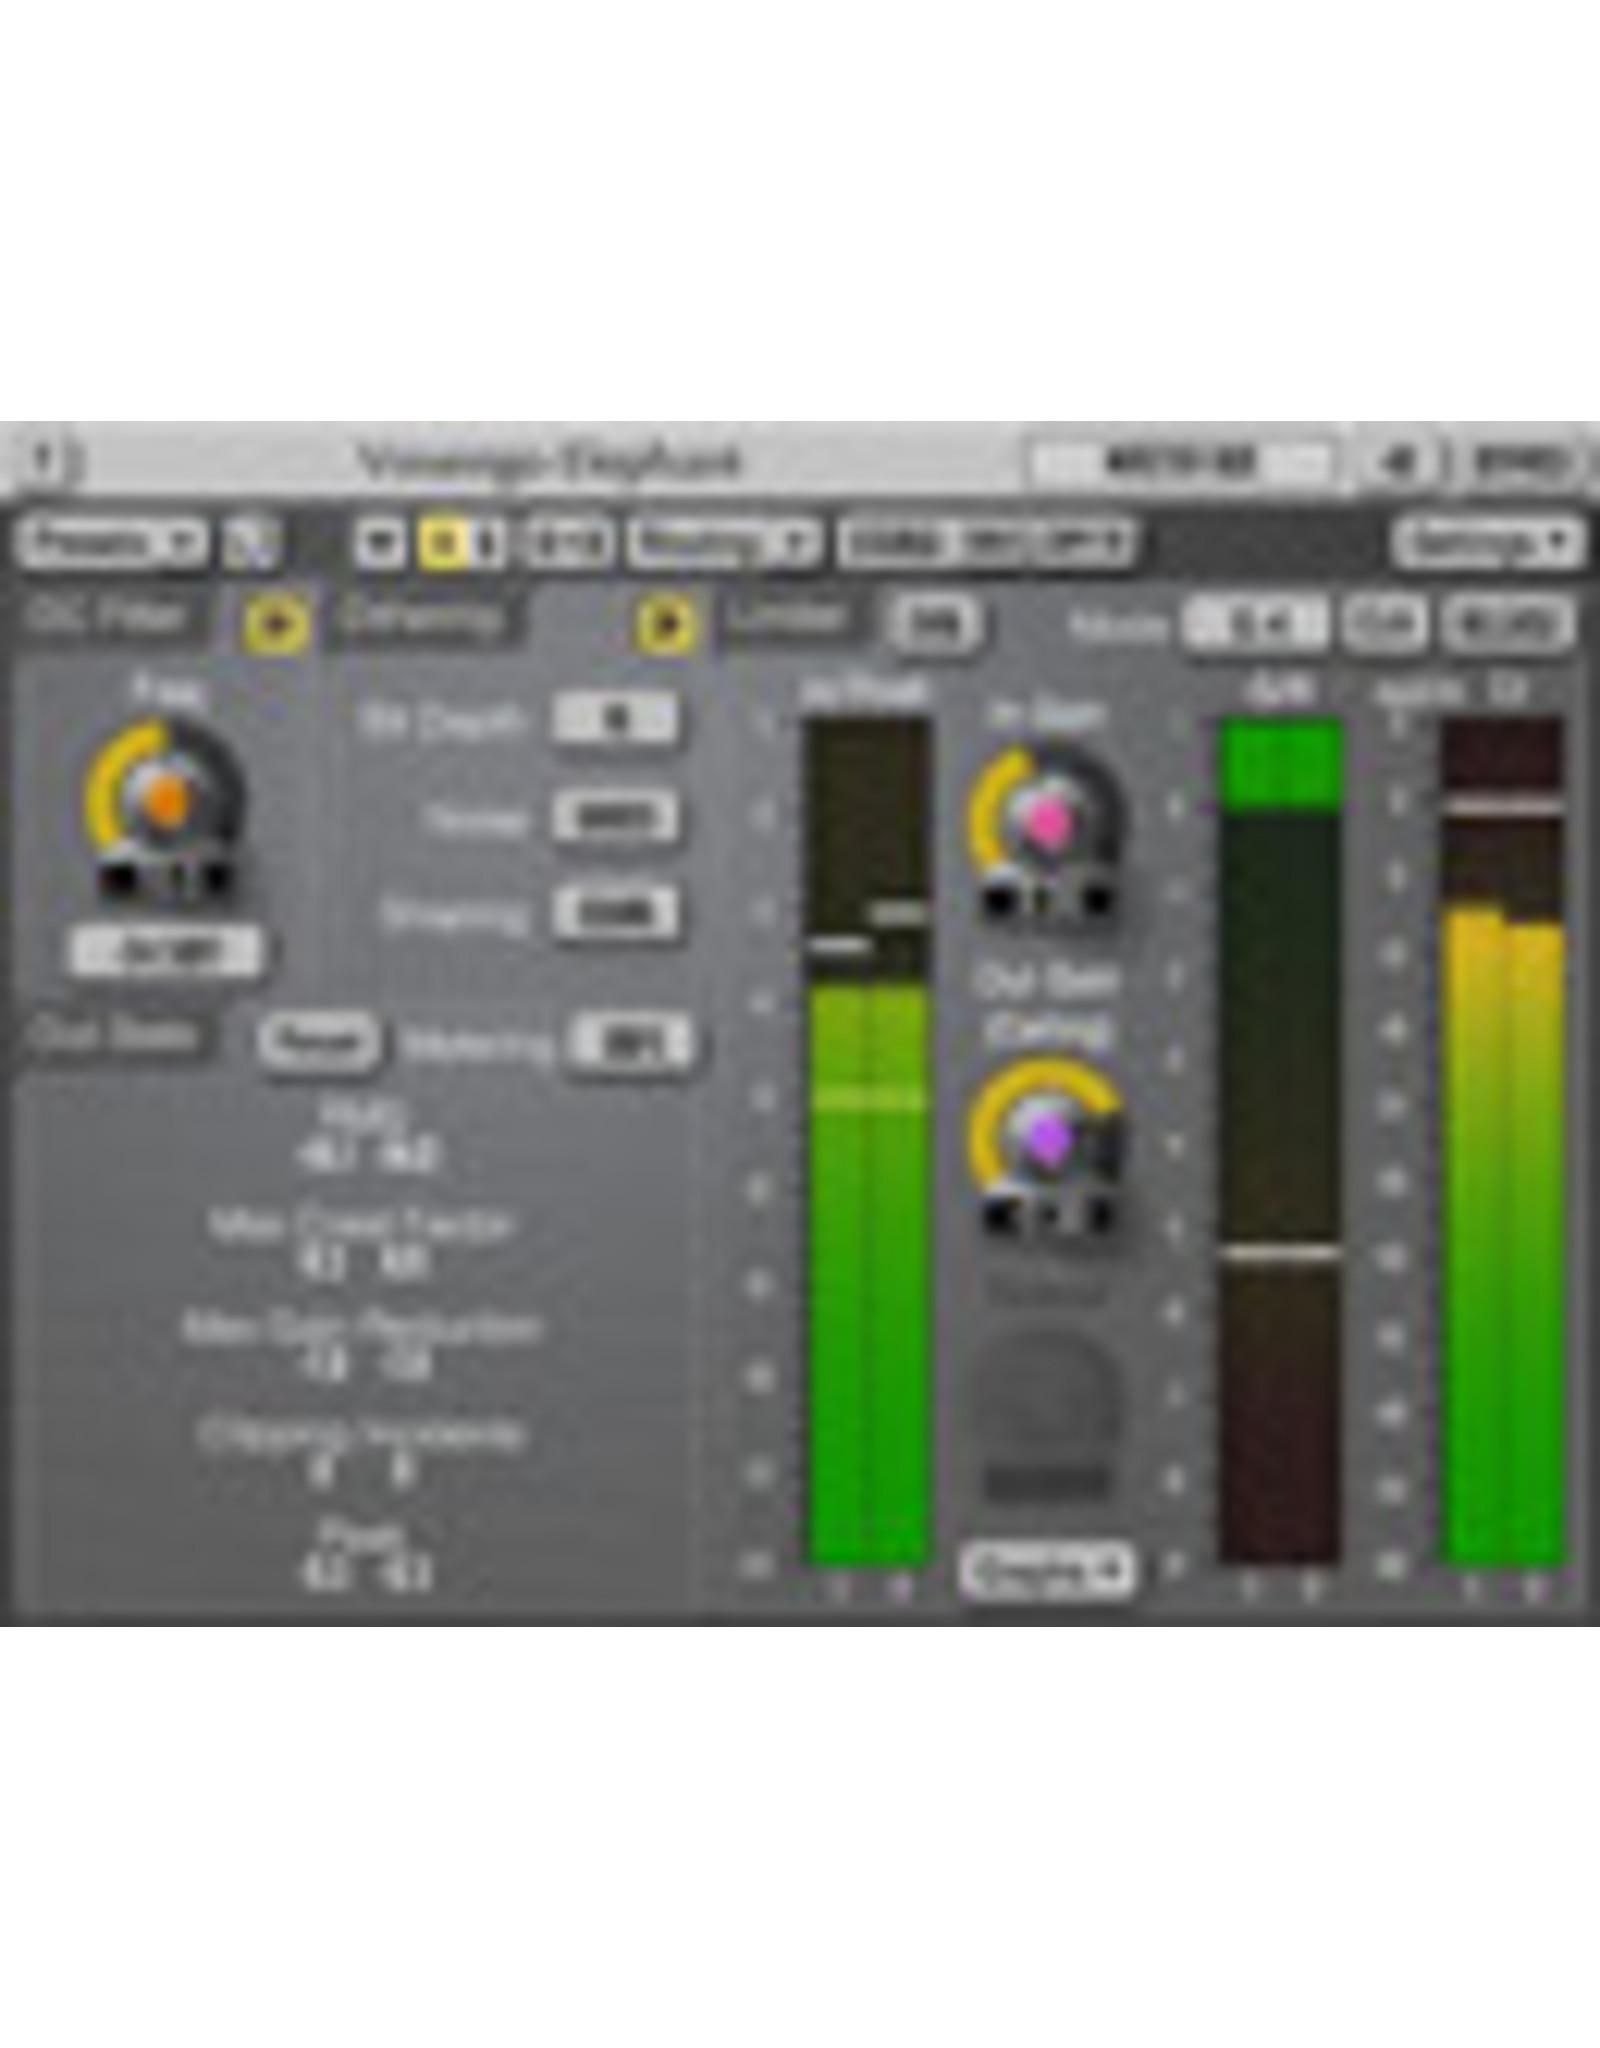 Voxengo Elephant Mastering Limiter VST Plug-in for EDIUS